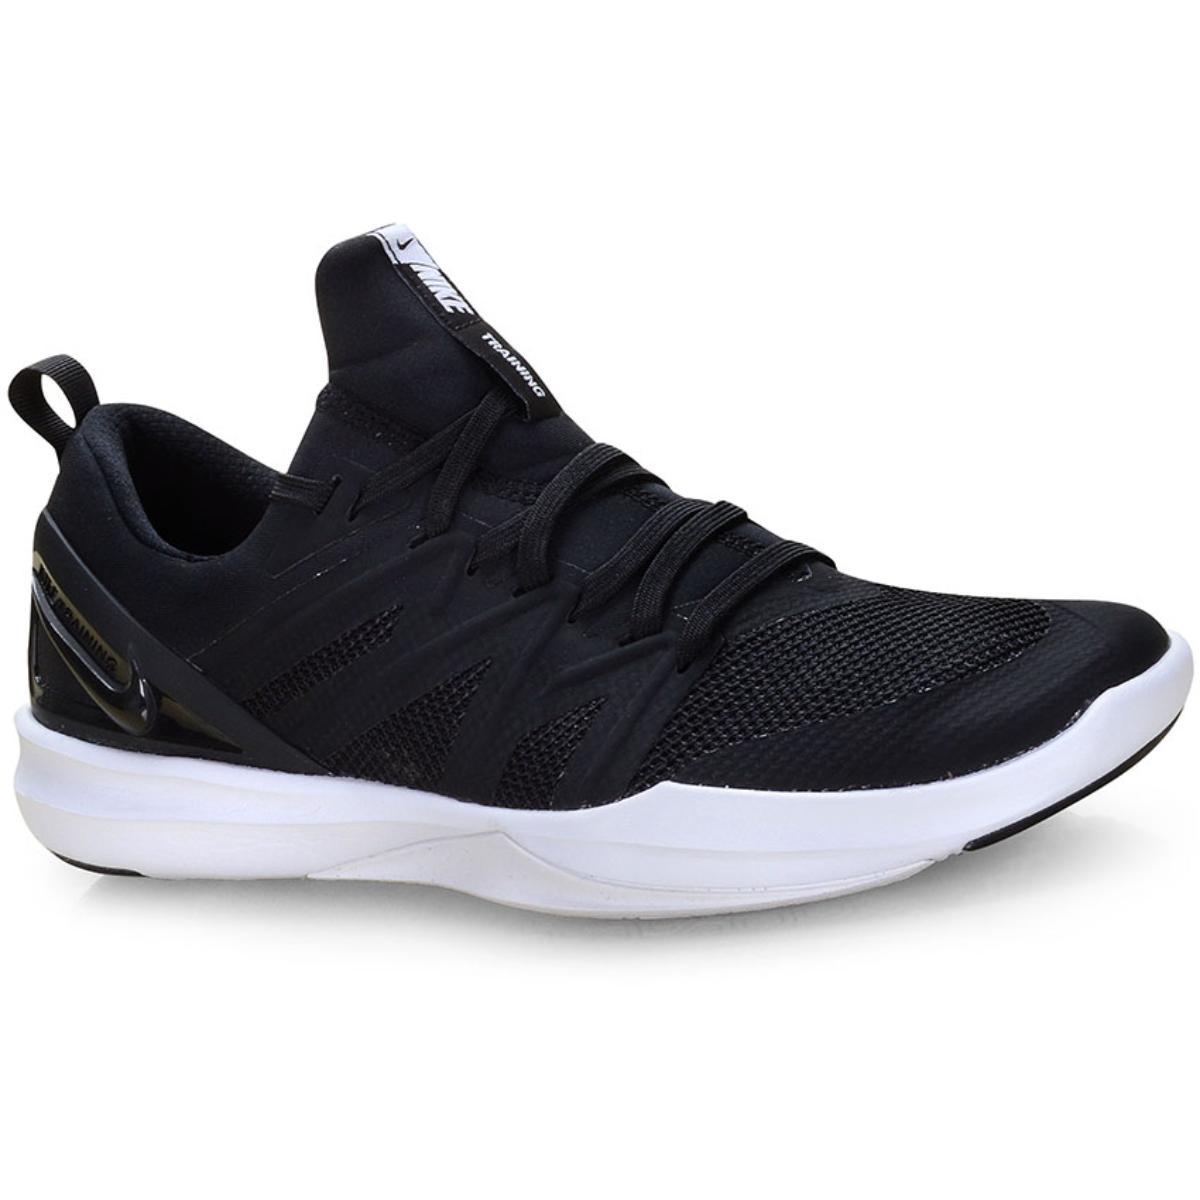 Tênis Masculino Nike Ao4402-001 Victory Elite Preto/branco